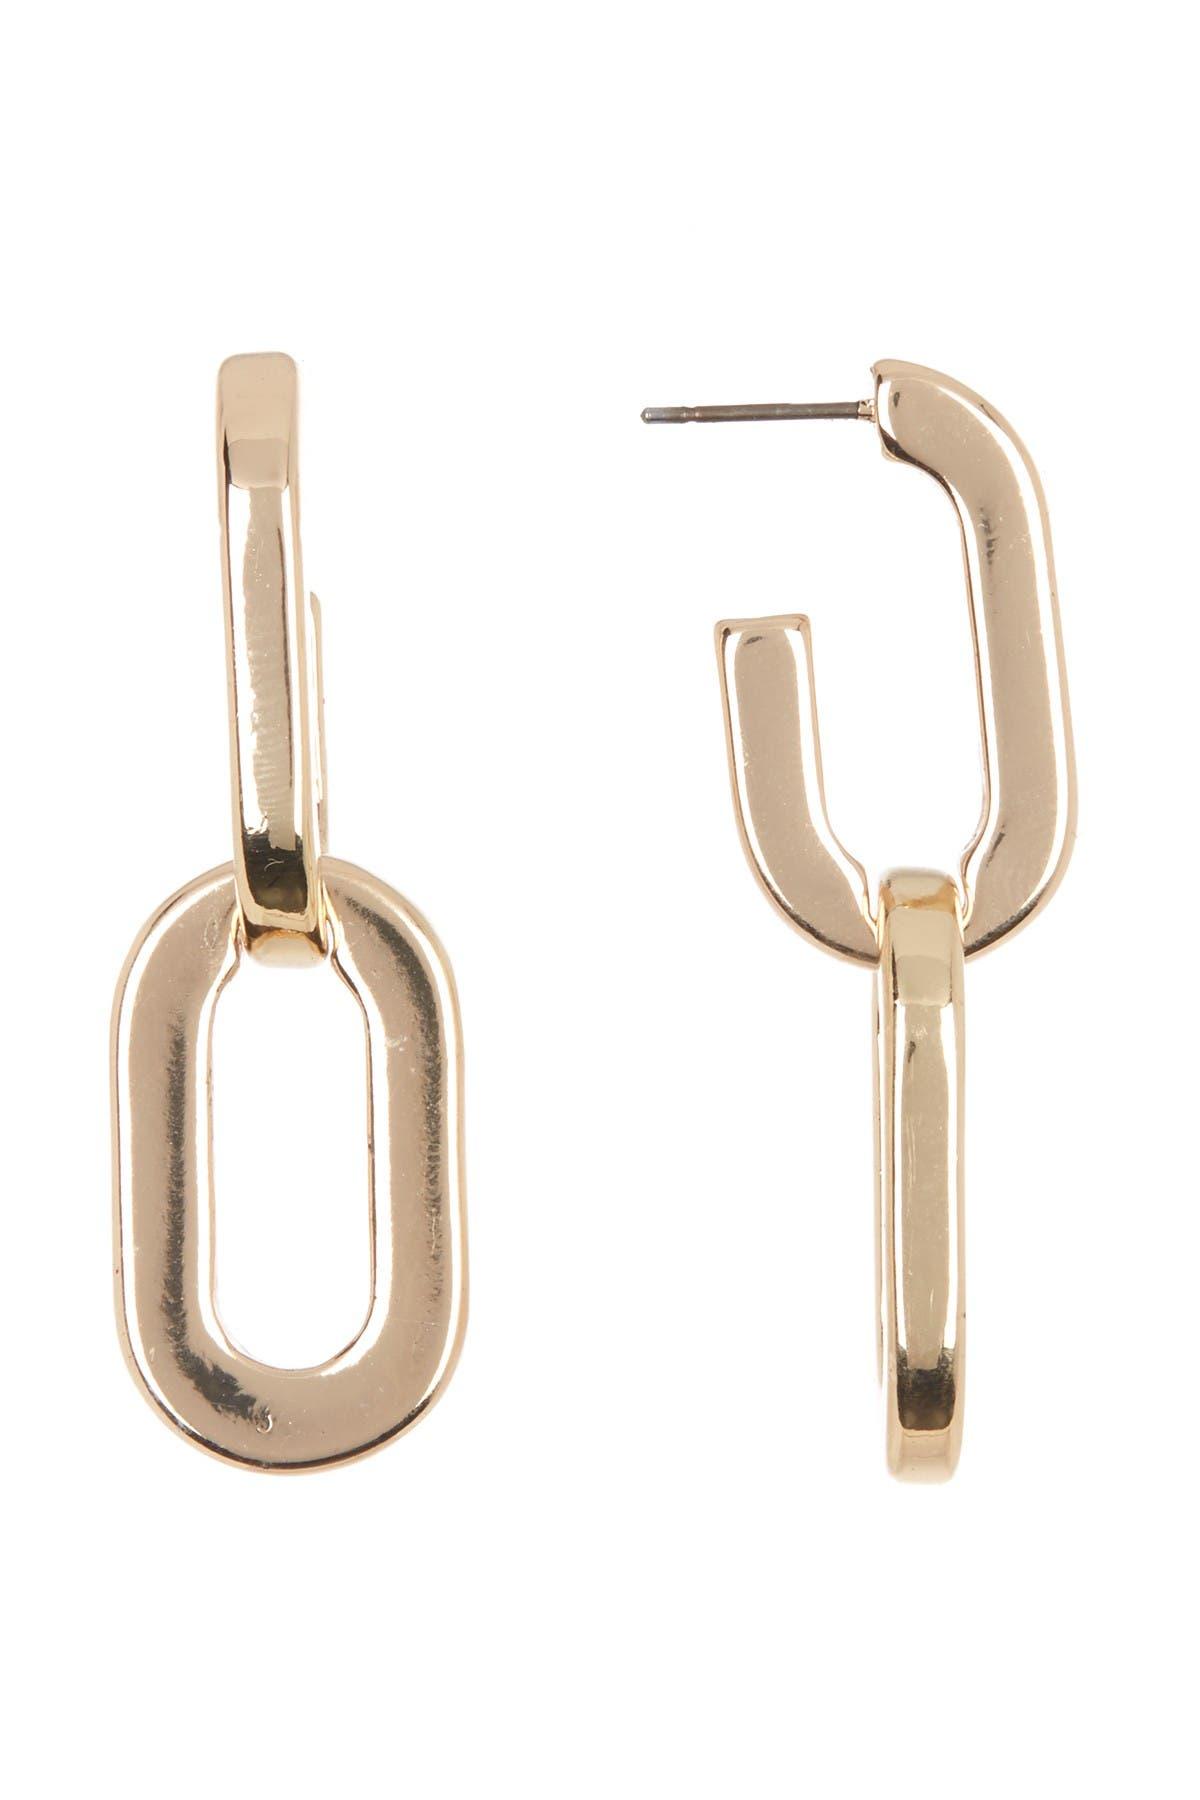 Image of AREA STARS Wide Link Dangle Earrings